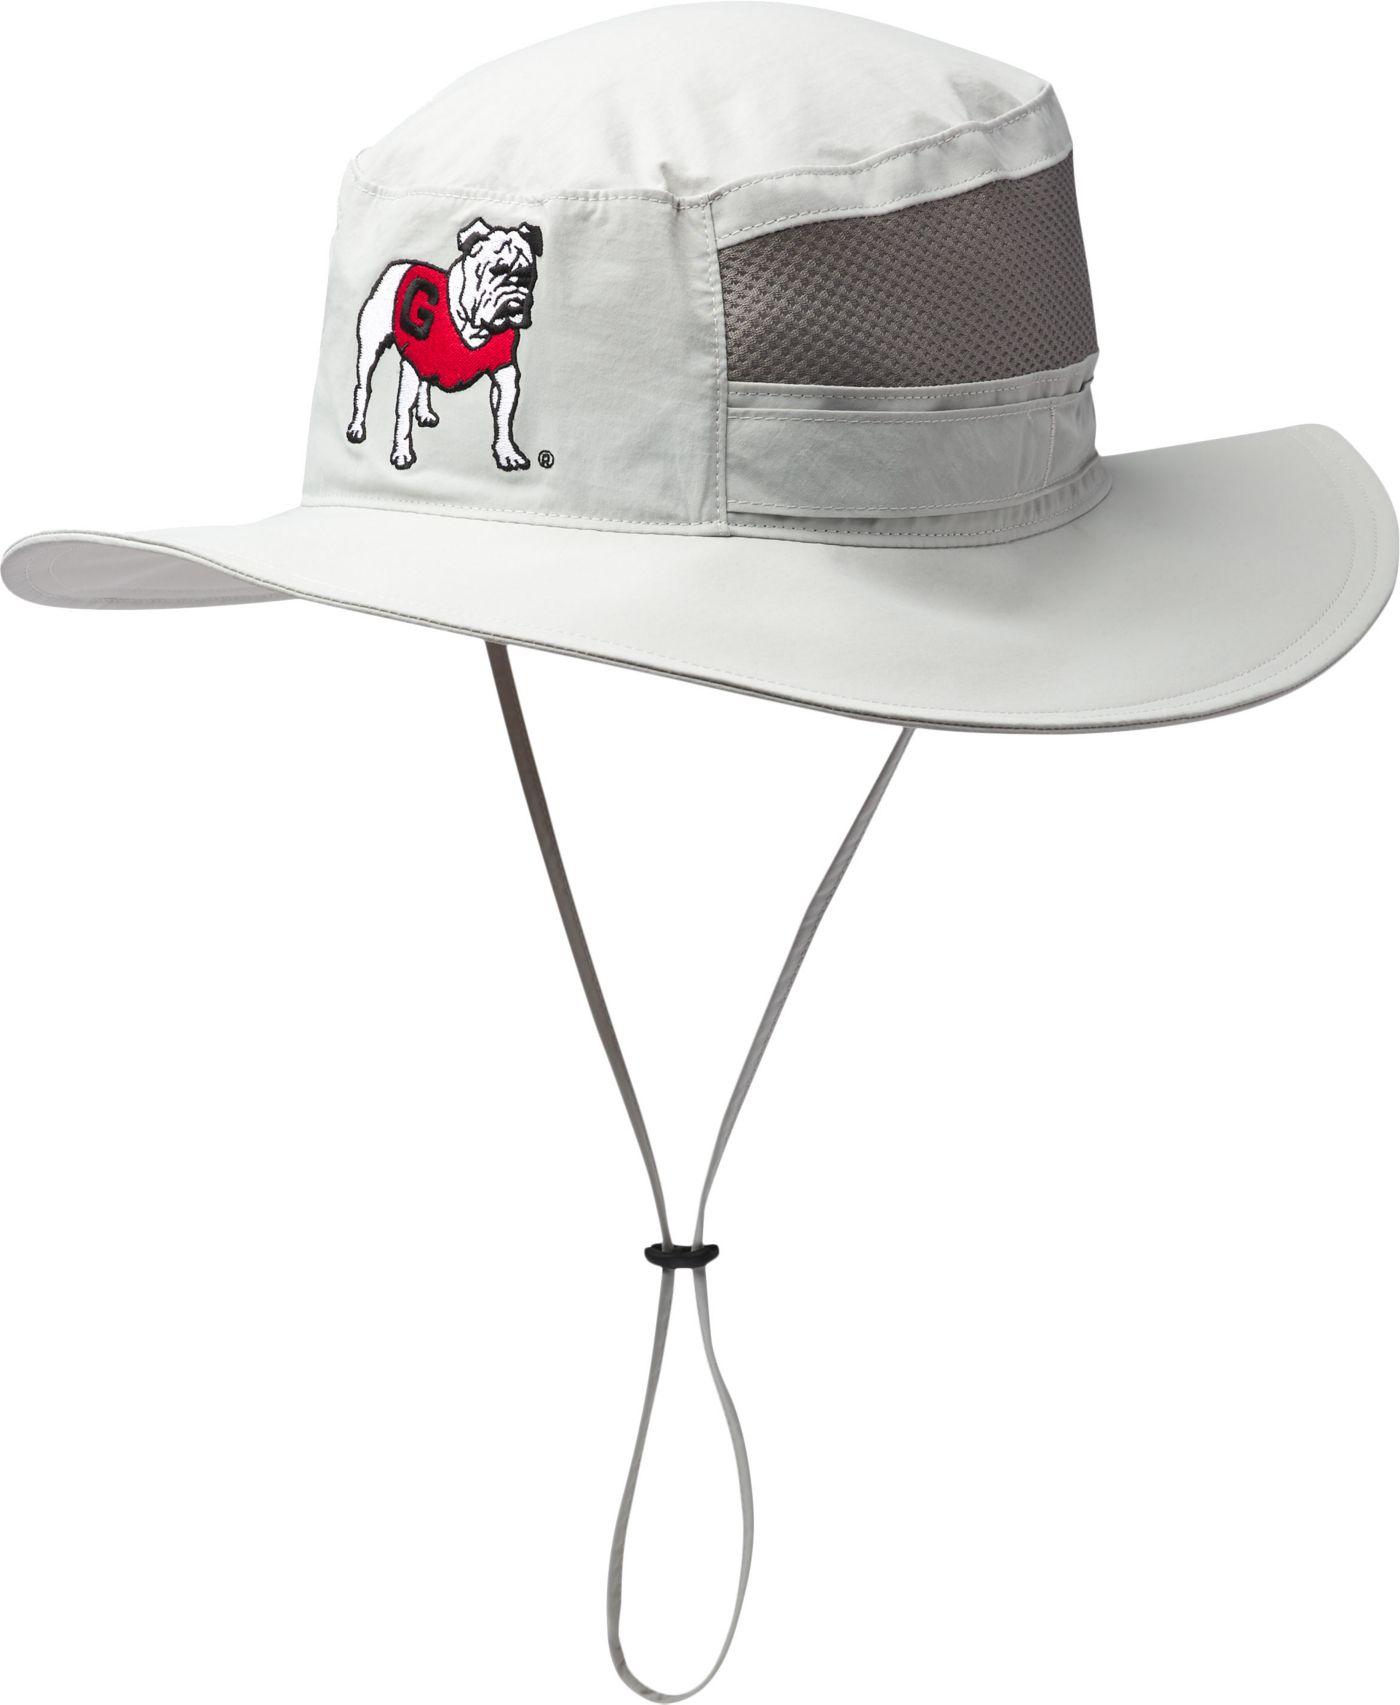 Columbia Men's Georgia Bulldogs Grey Bora Bora Booney Hat